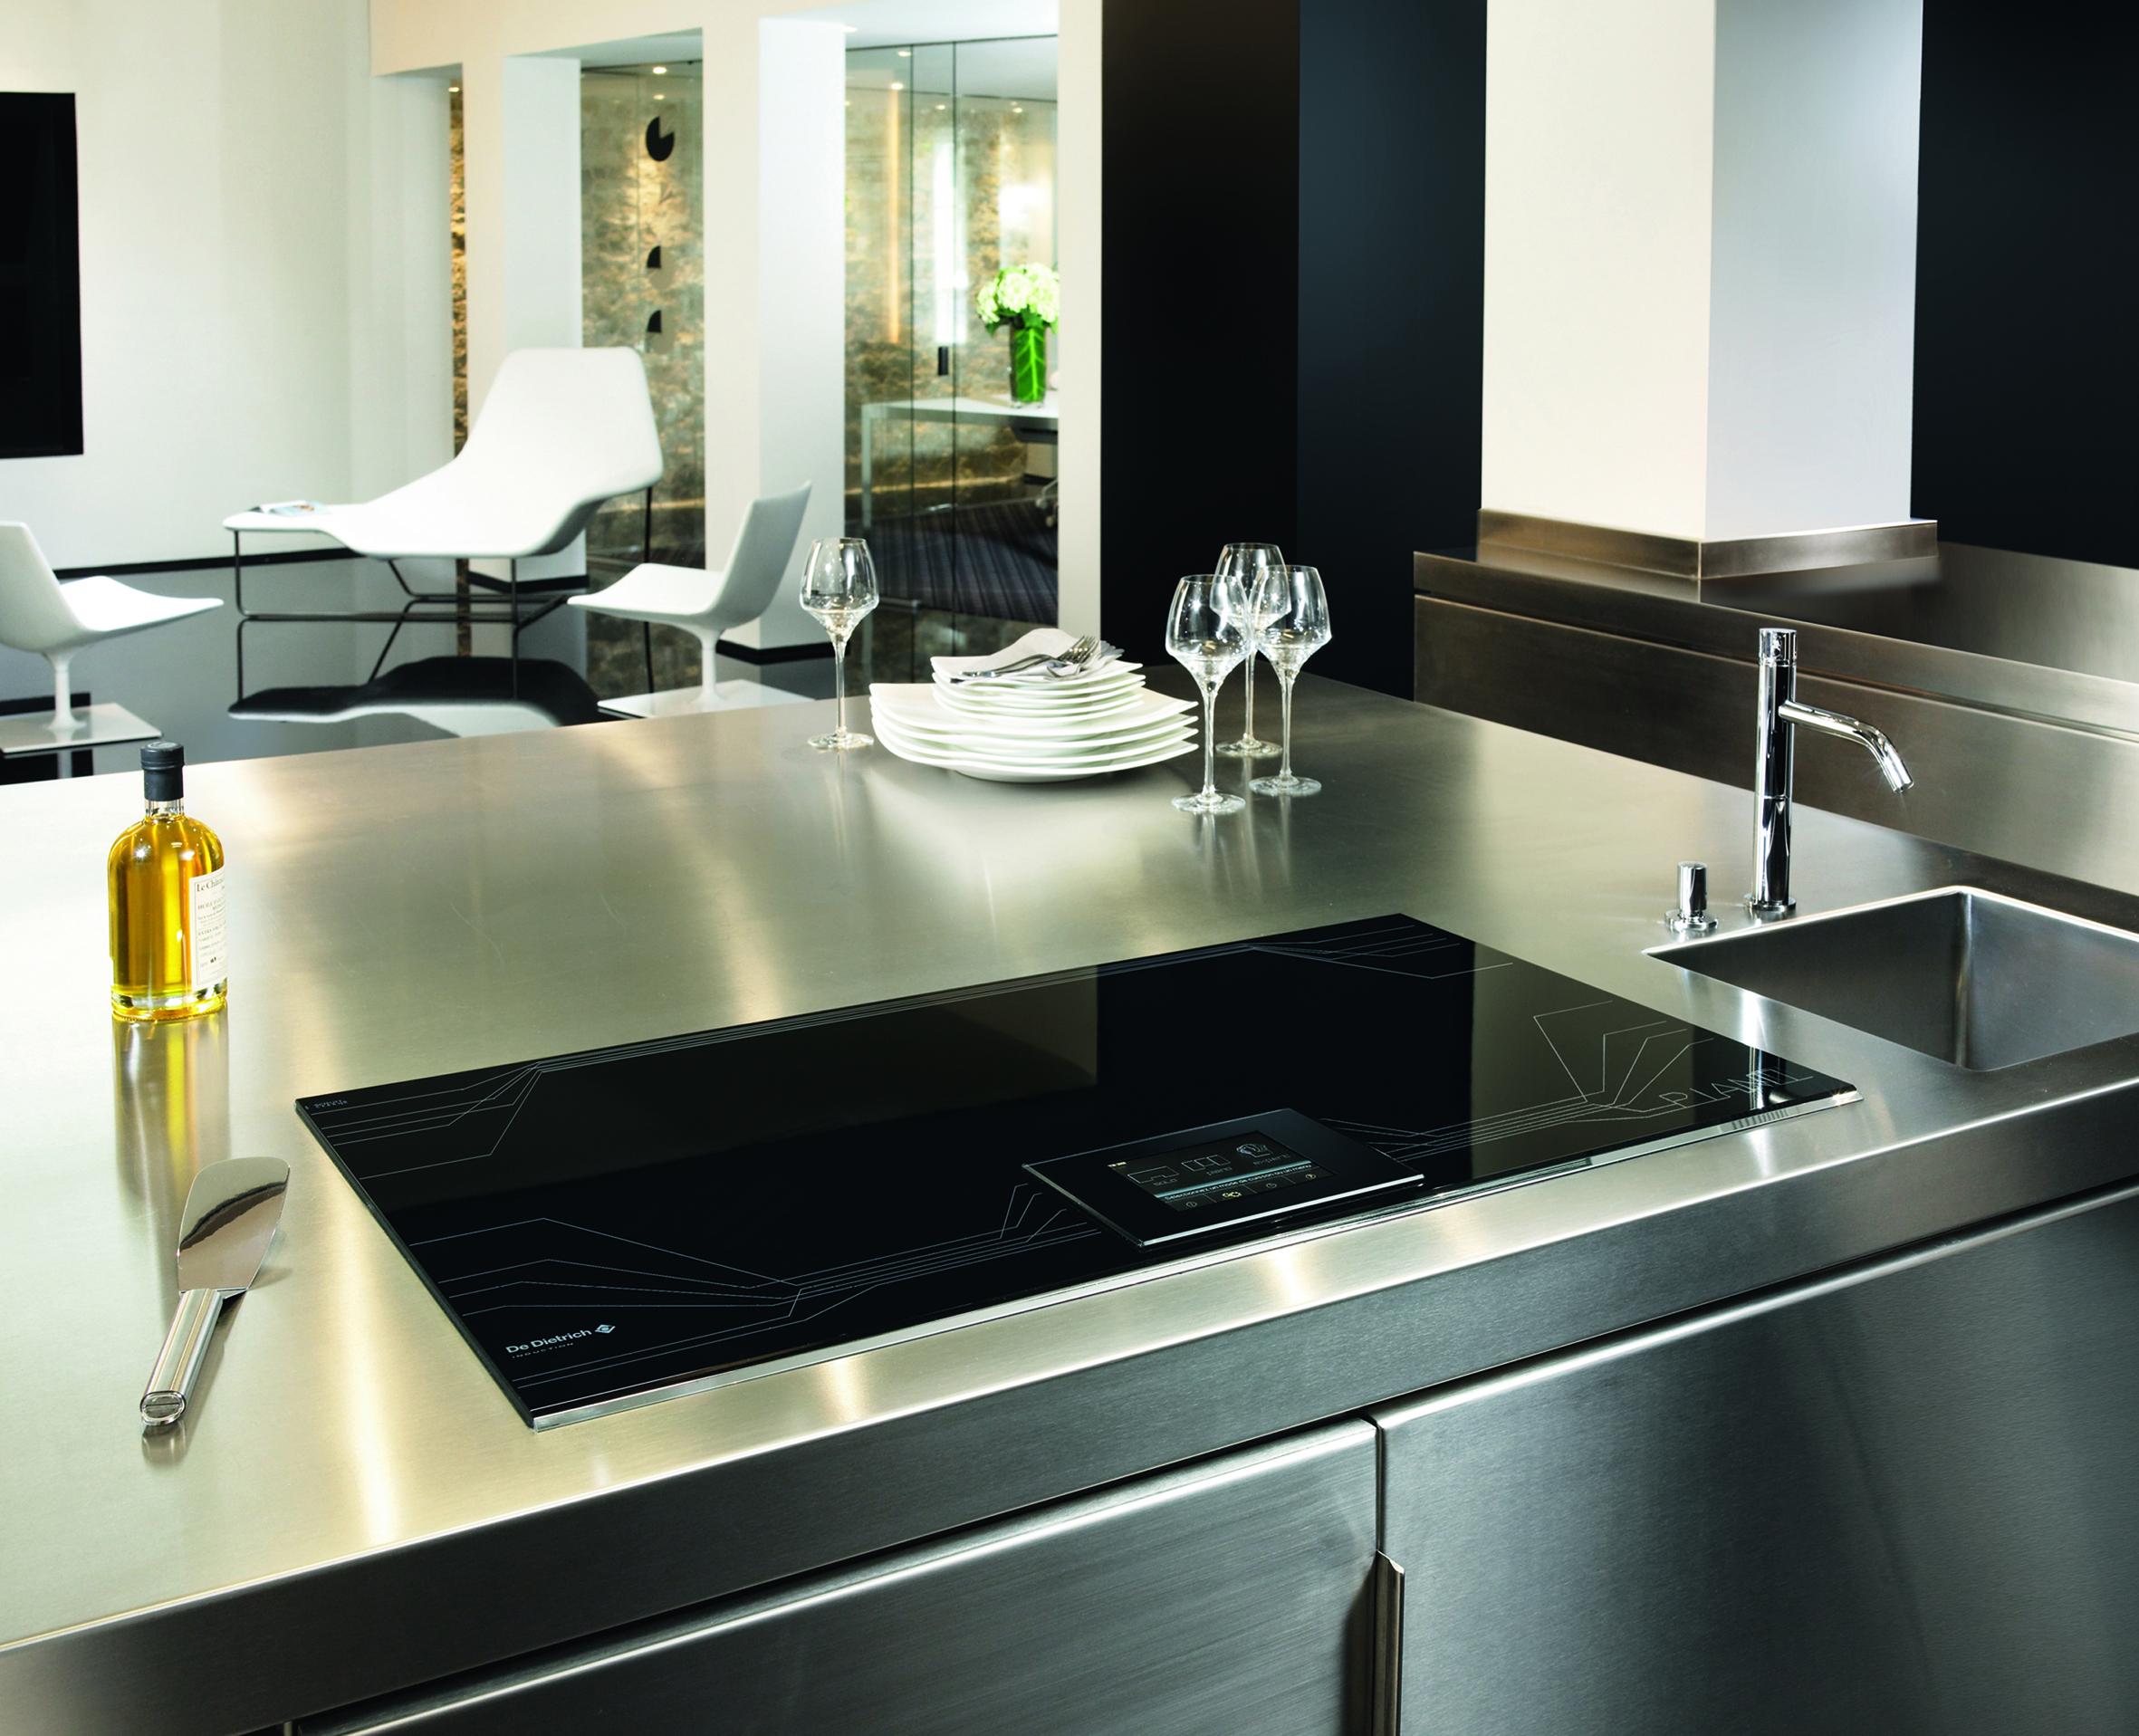 Piano Induzione Neff Flexinduction cook top kitchen accessories in kalyani nagar induction